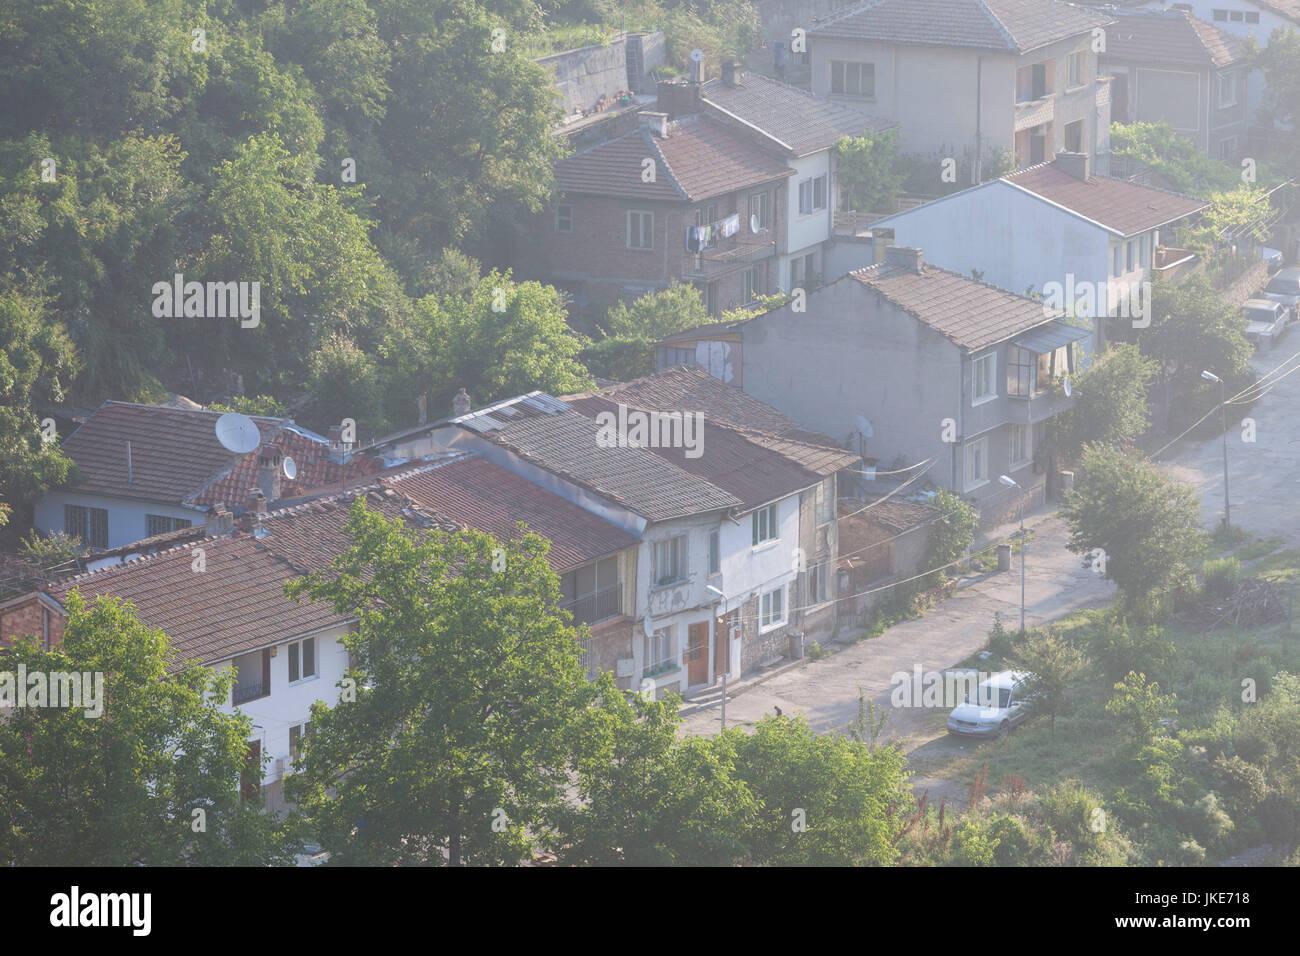 Bulgaria, Central Mountains, Veliko Tarnovo, Asenova, Old Fortress Area, Tsarevets Fortress, elevated view of the Stock Photo